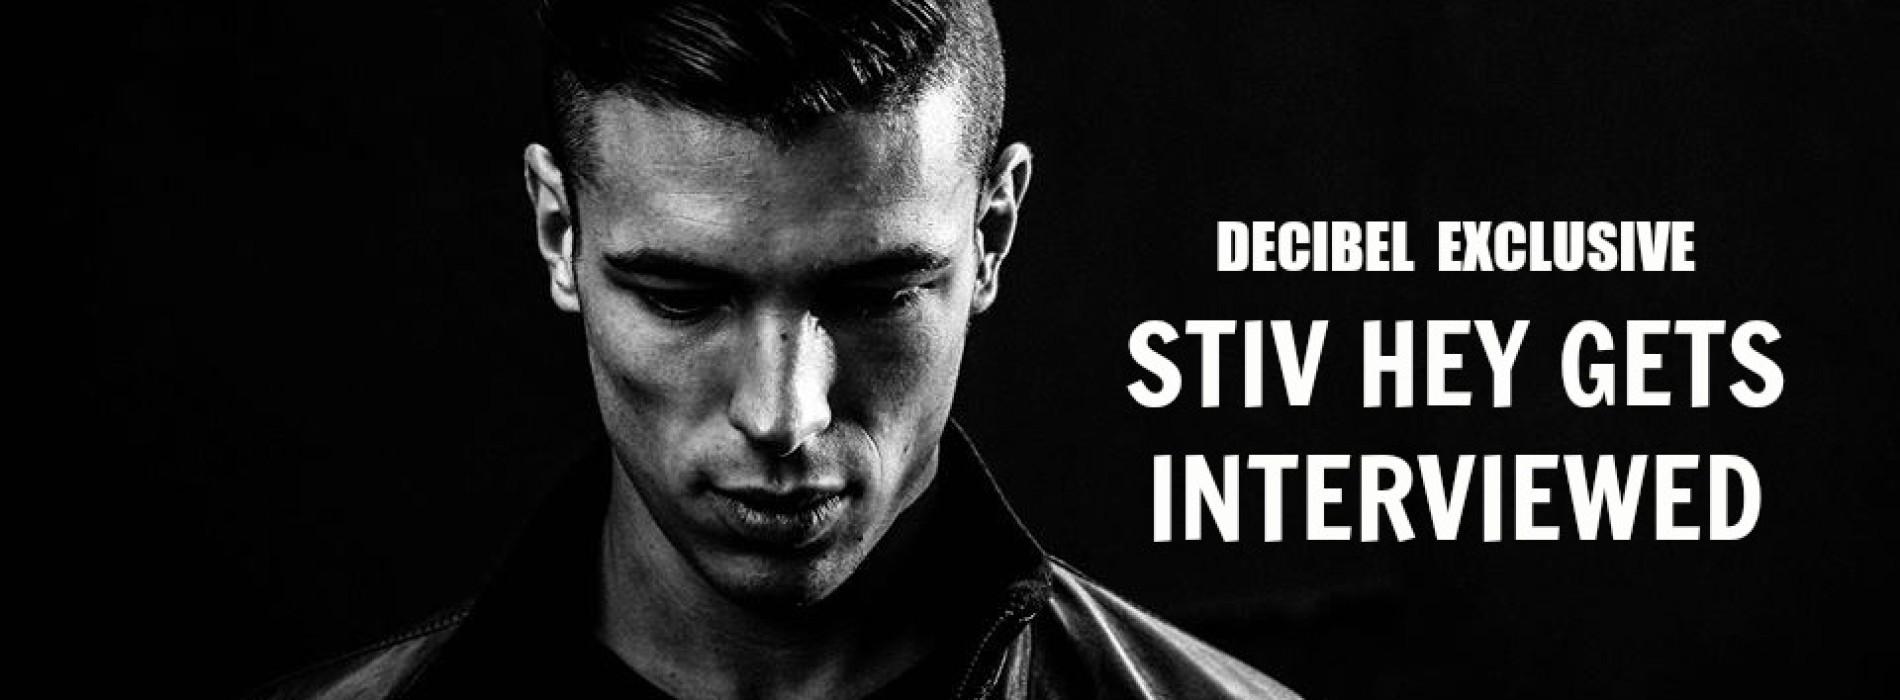 Decibel Exclusive: Stiv Hey